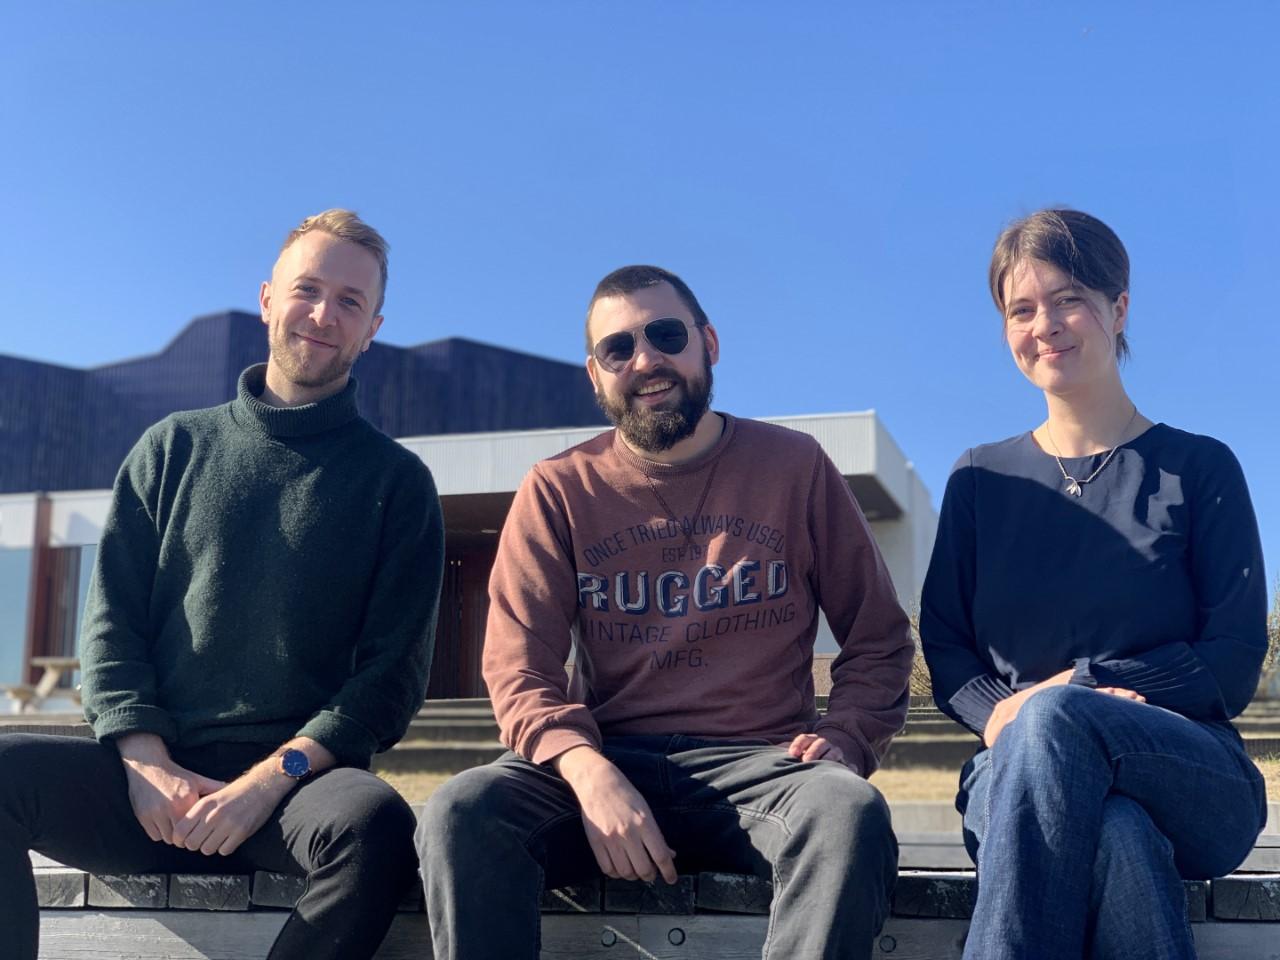 Nordens hus i Reykjavik söker praktikanter